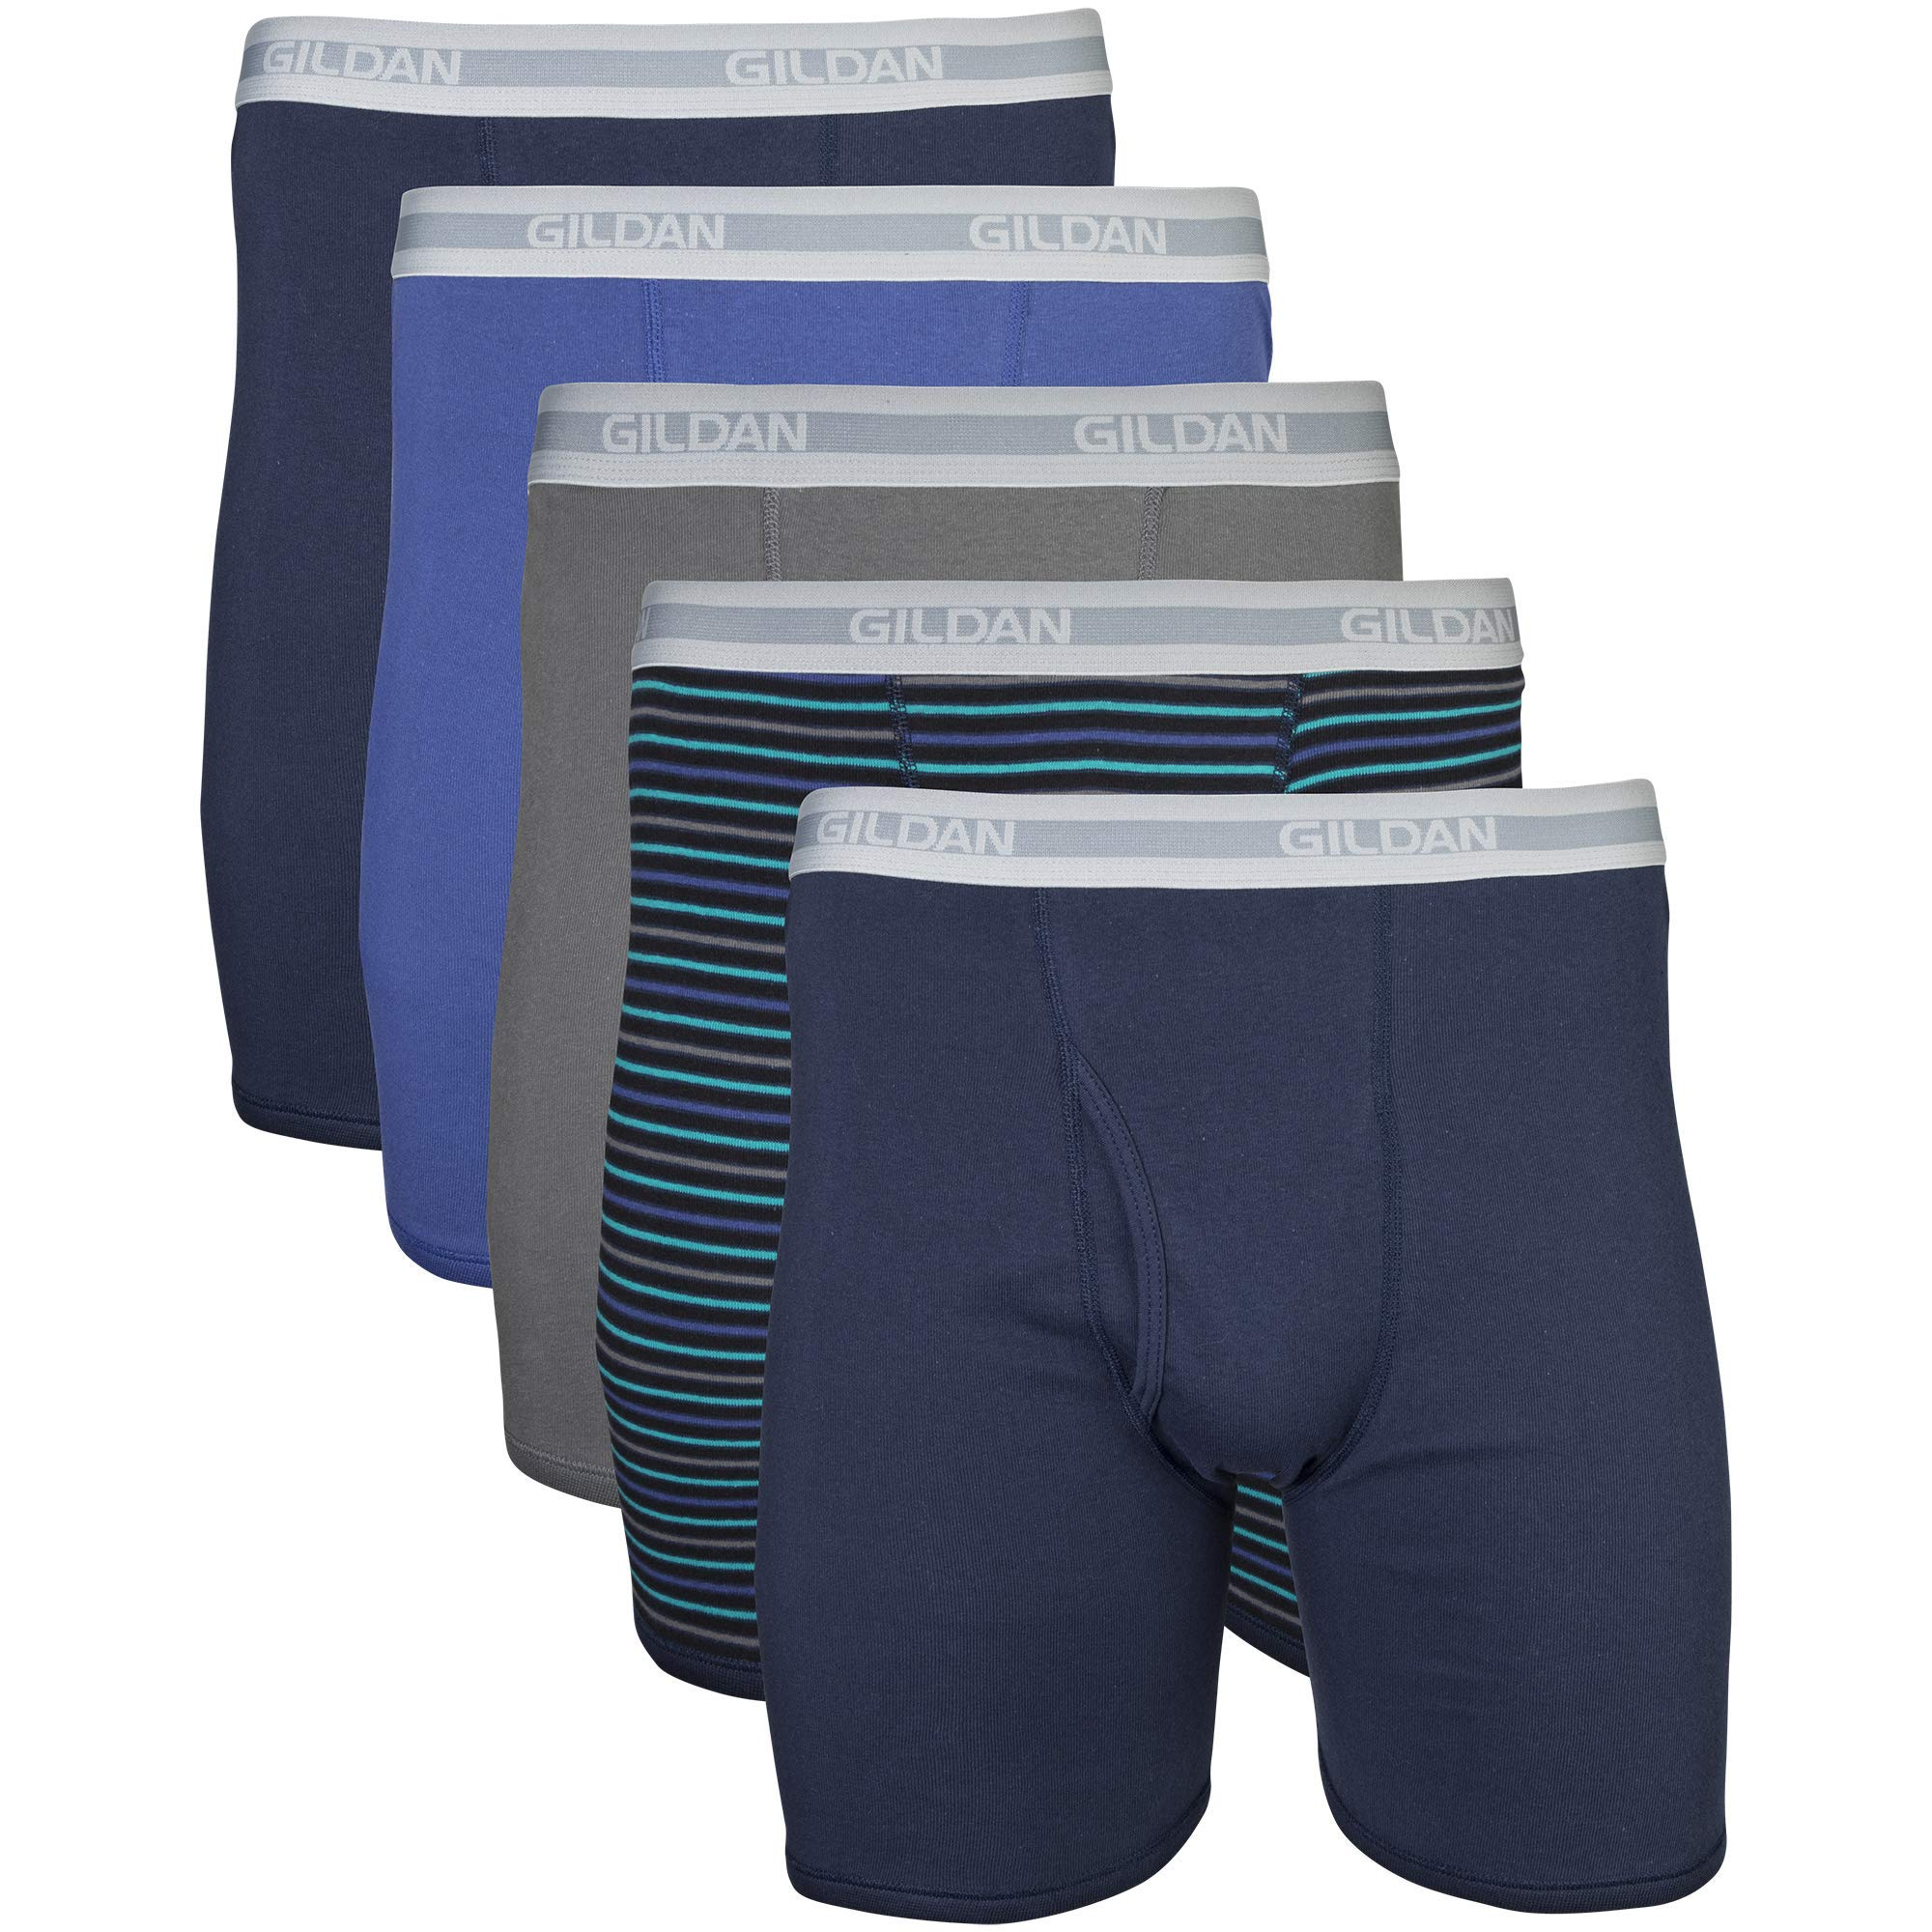 Gildan Men's Regular Leg Boxer Brief 5 Pack, Medium, Mixed Navy by Gildan